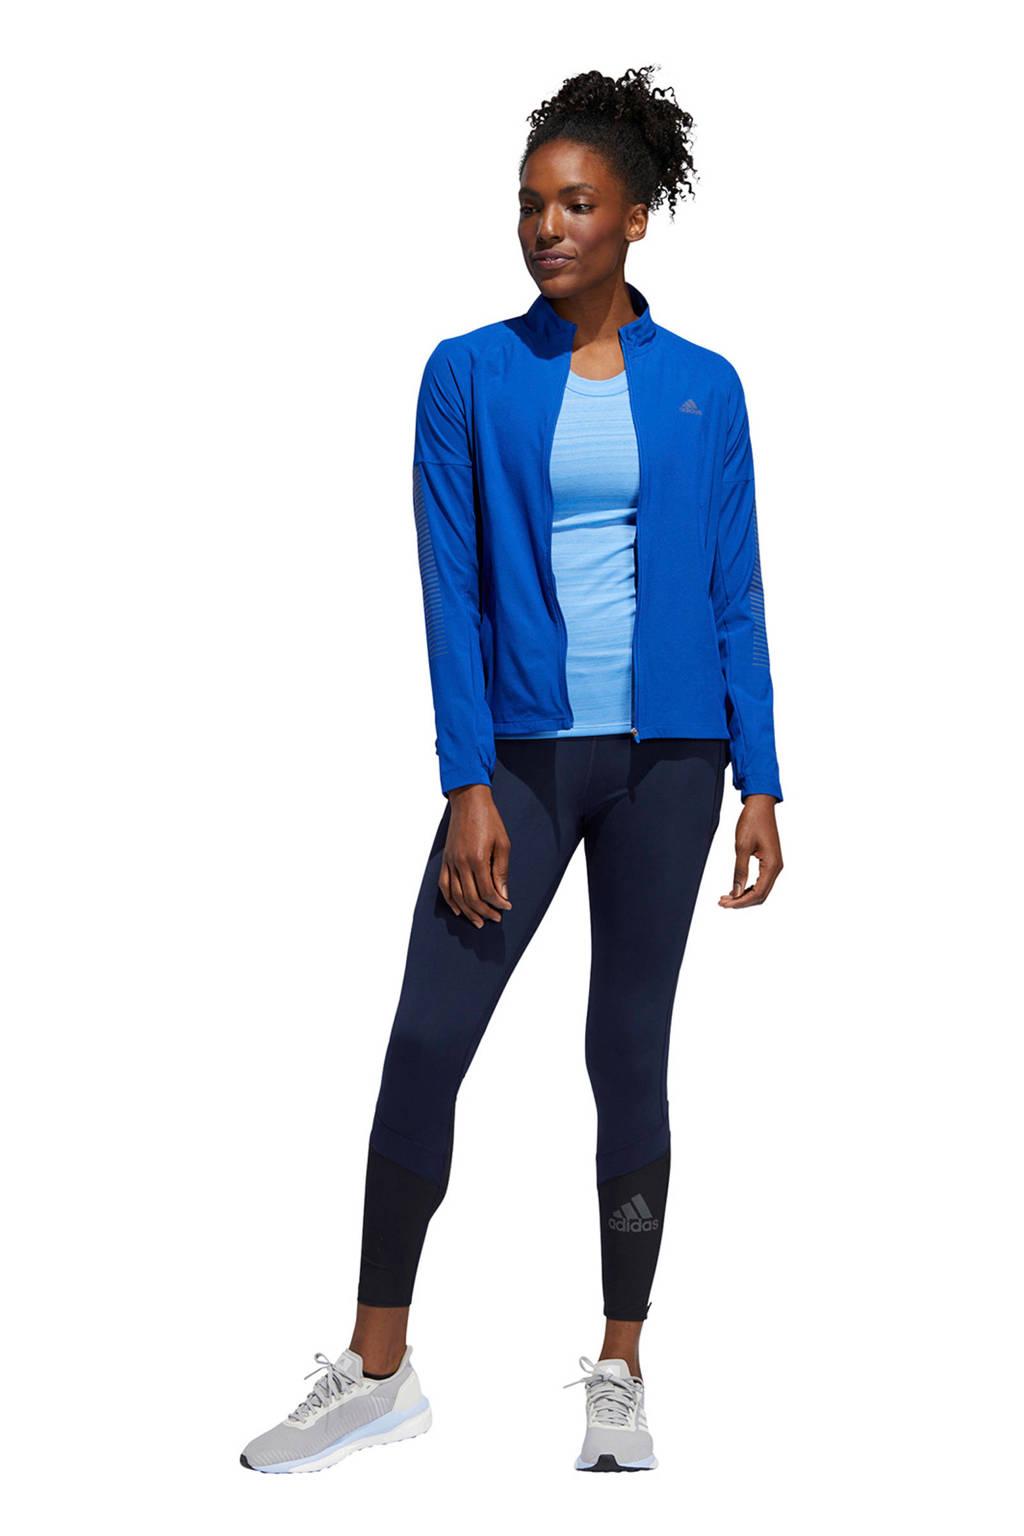 adidas performance hardloopshirt blauw, Blauw